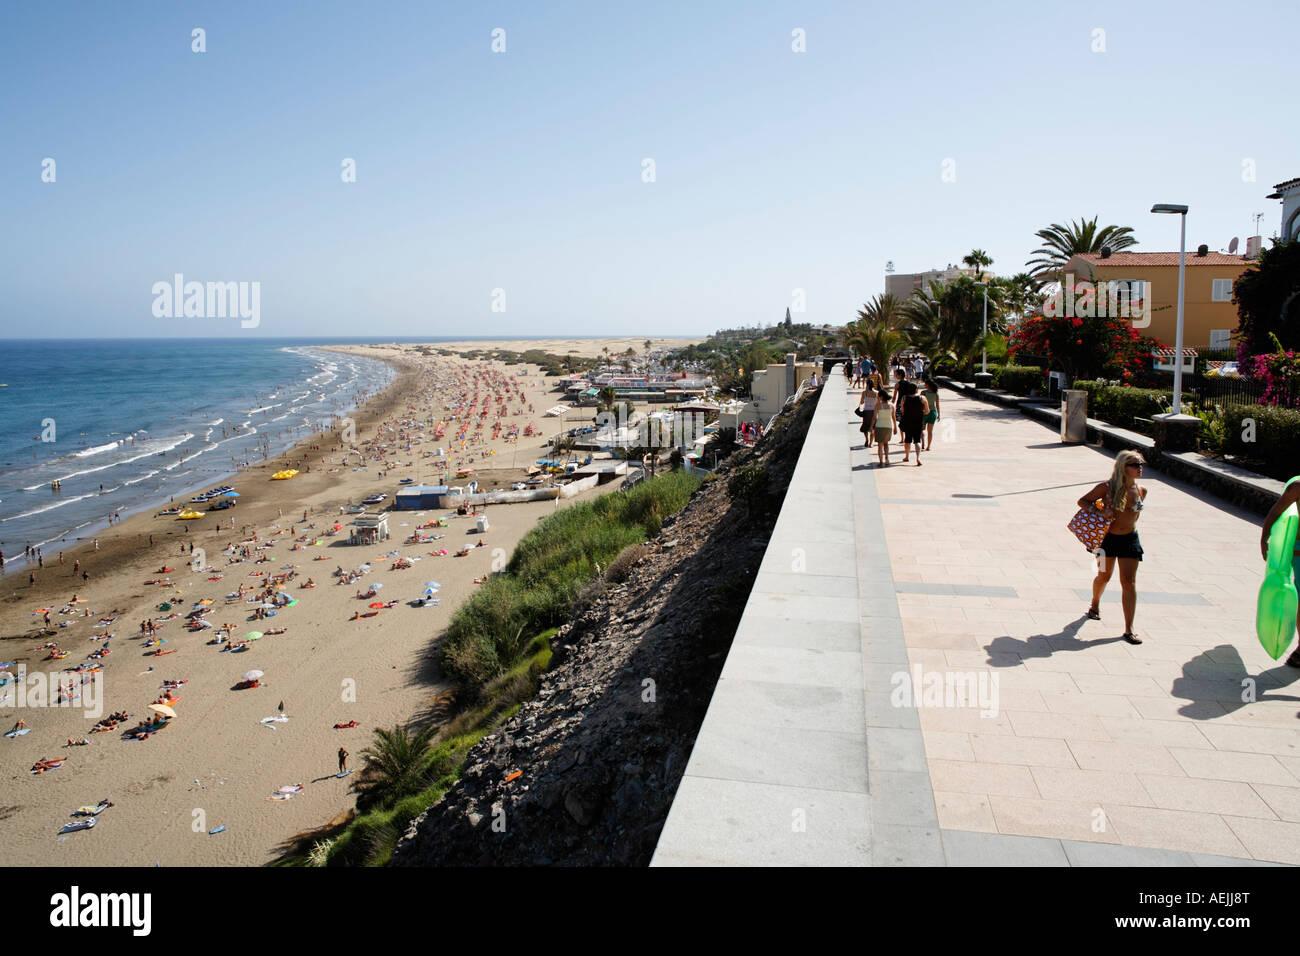 Promenade, Playa del Ingles, Costa Canaria, Gran Canaria, Spanien Stockbild